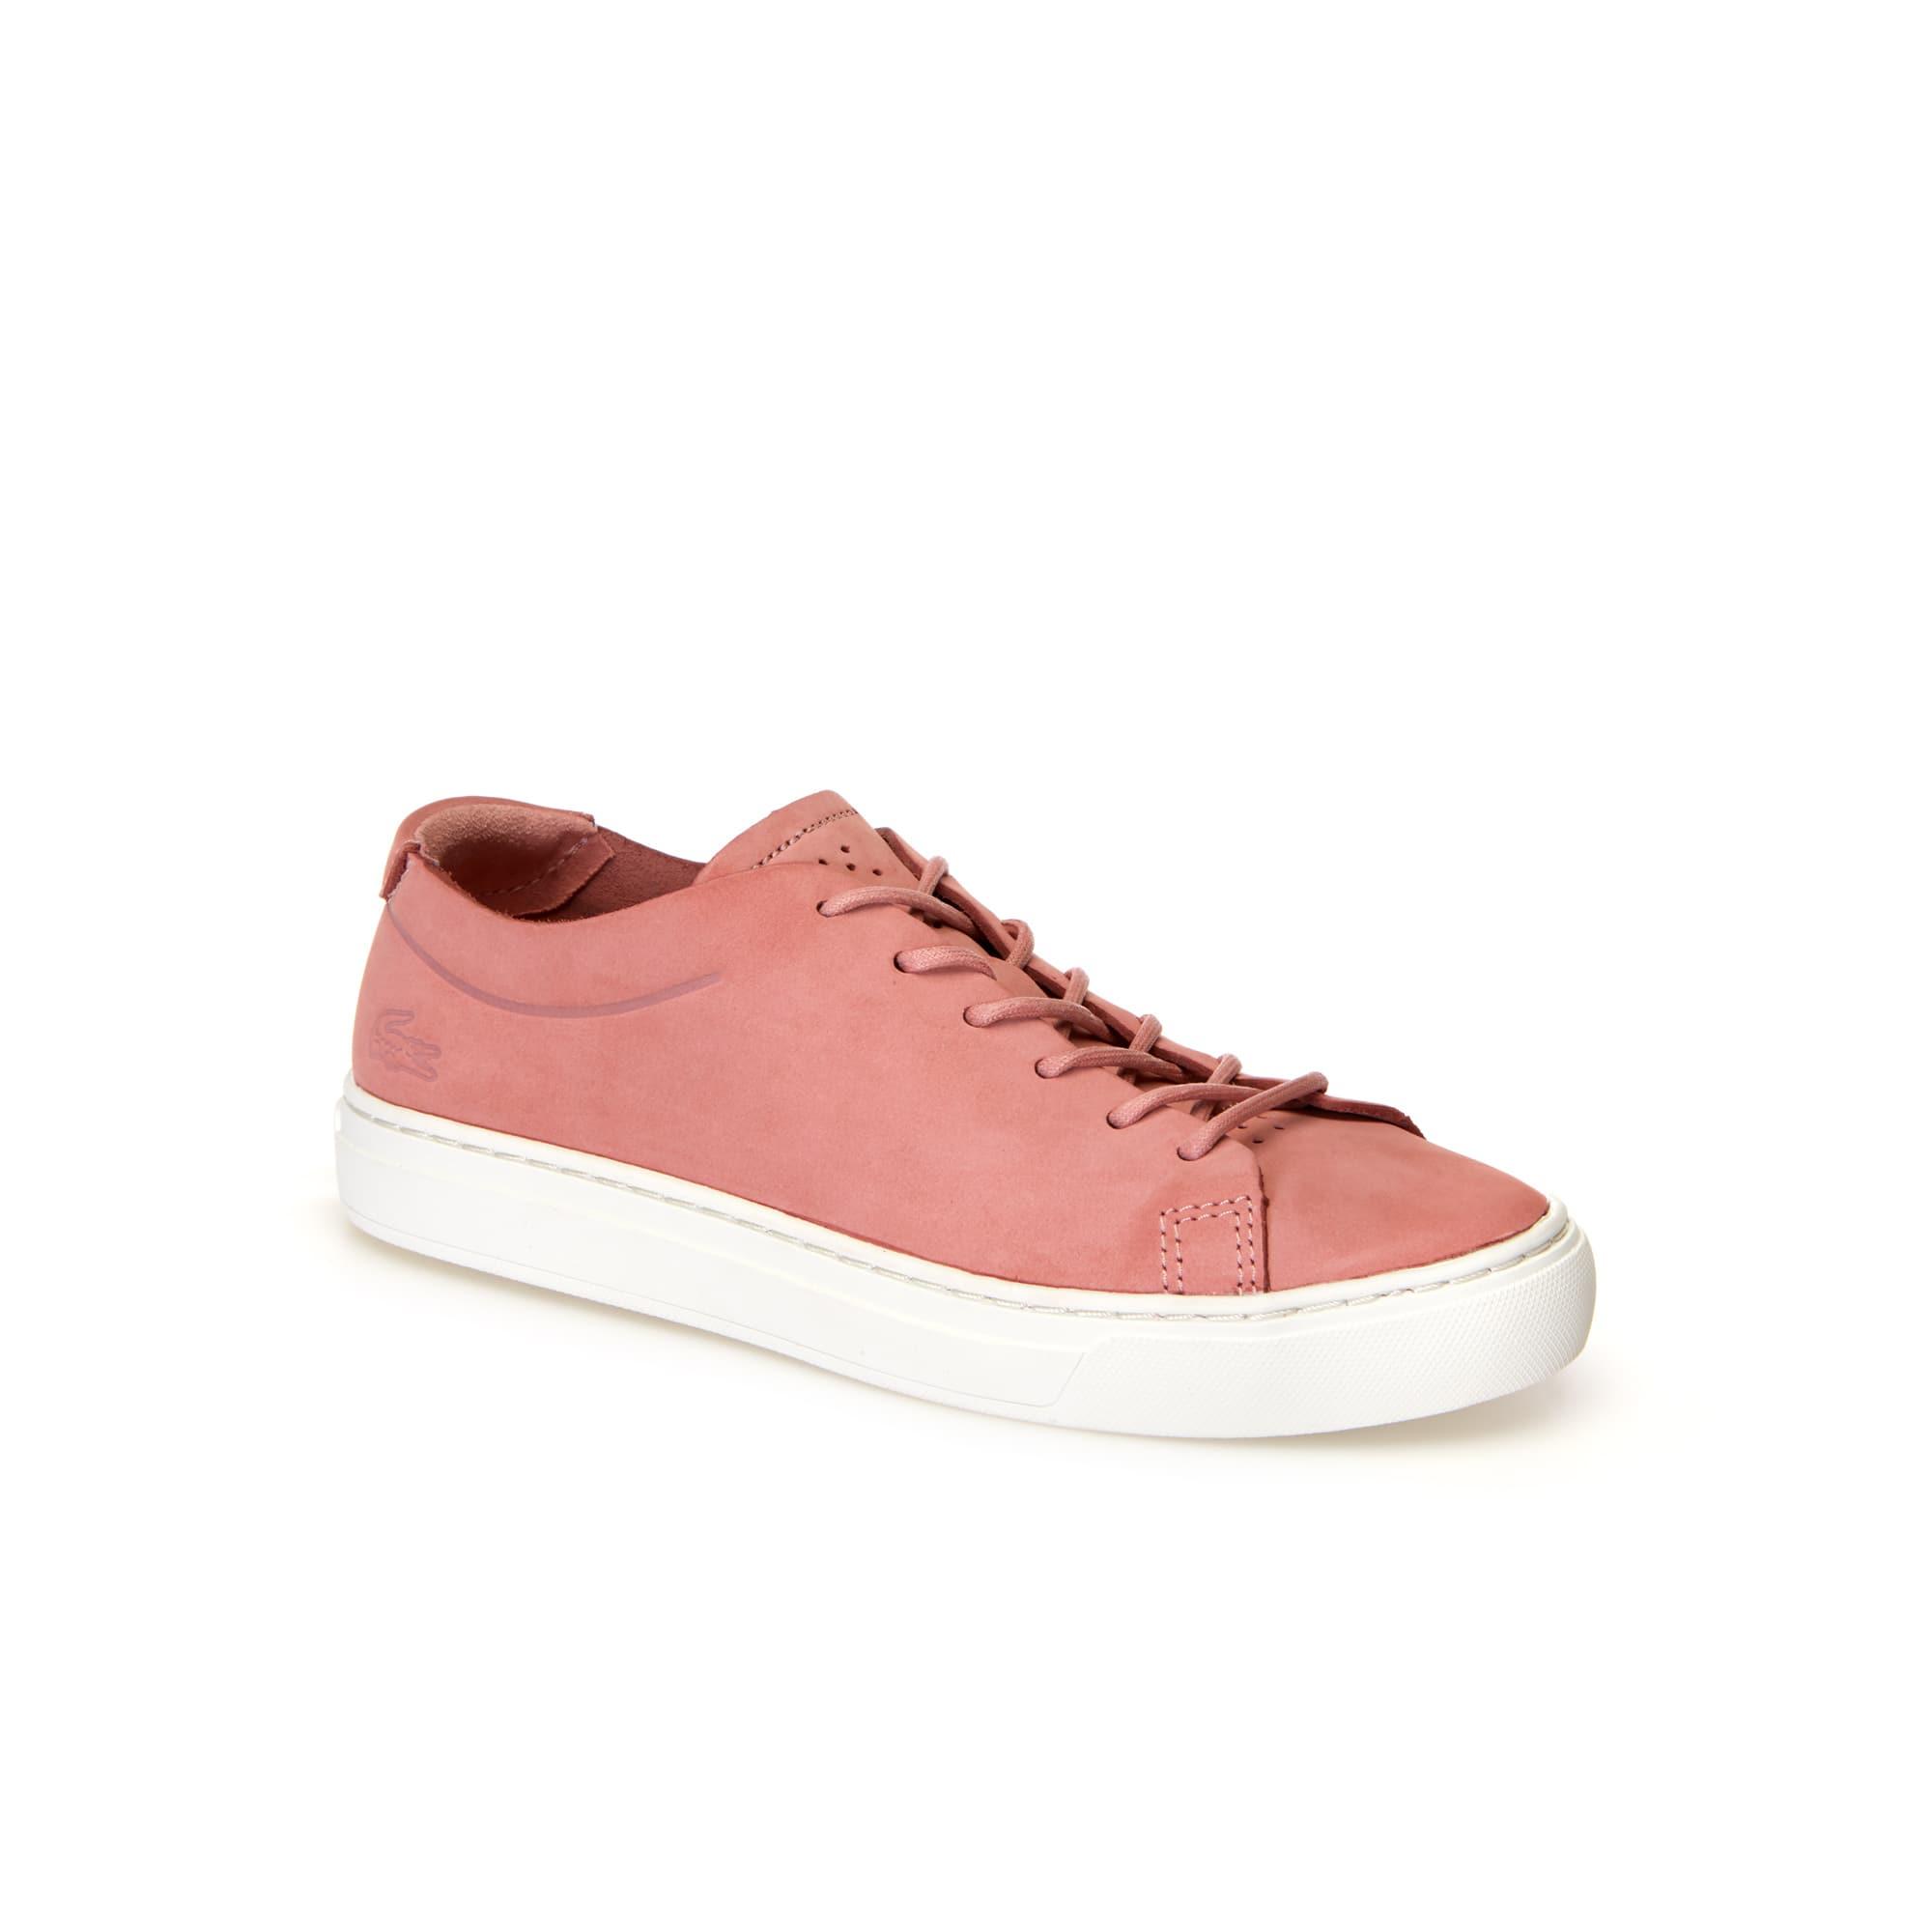 Damen-Sneakers L.12.12 UNLINED aus Nubukleder